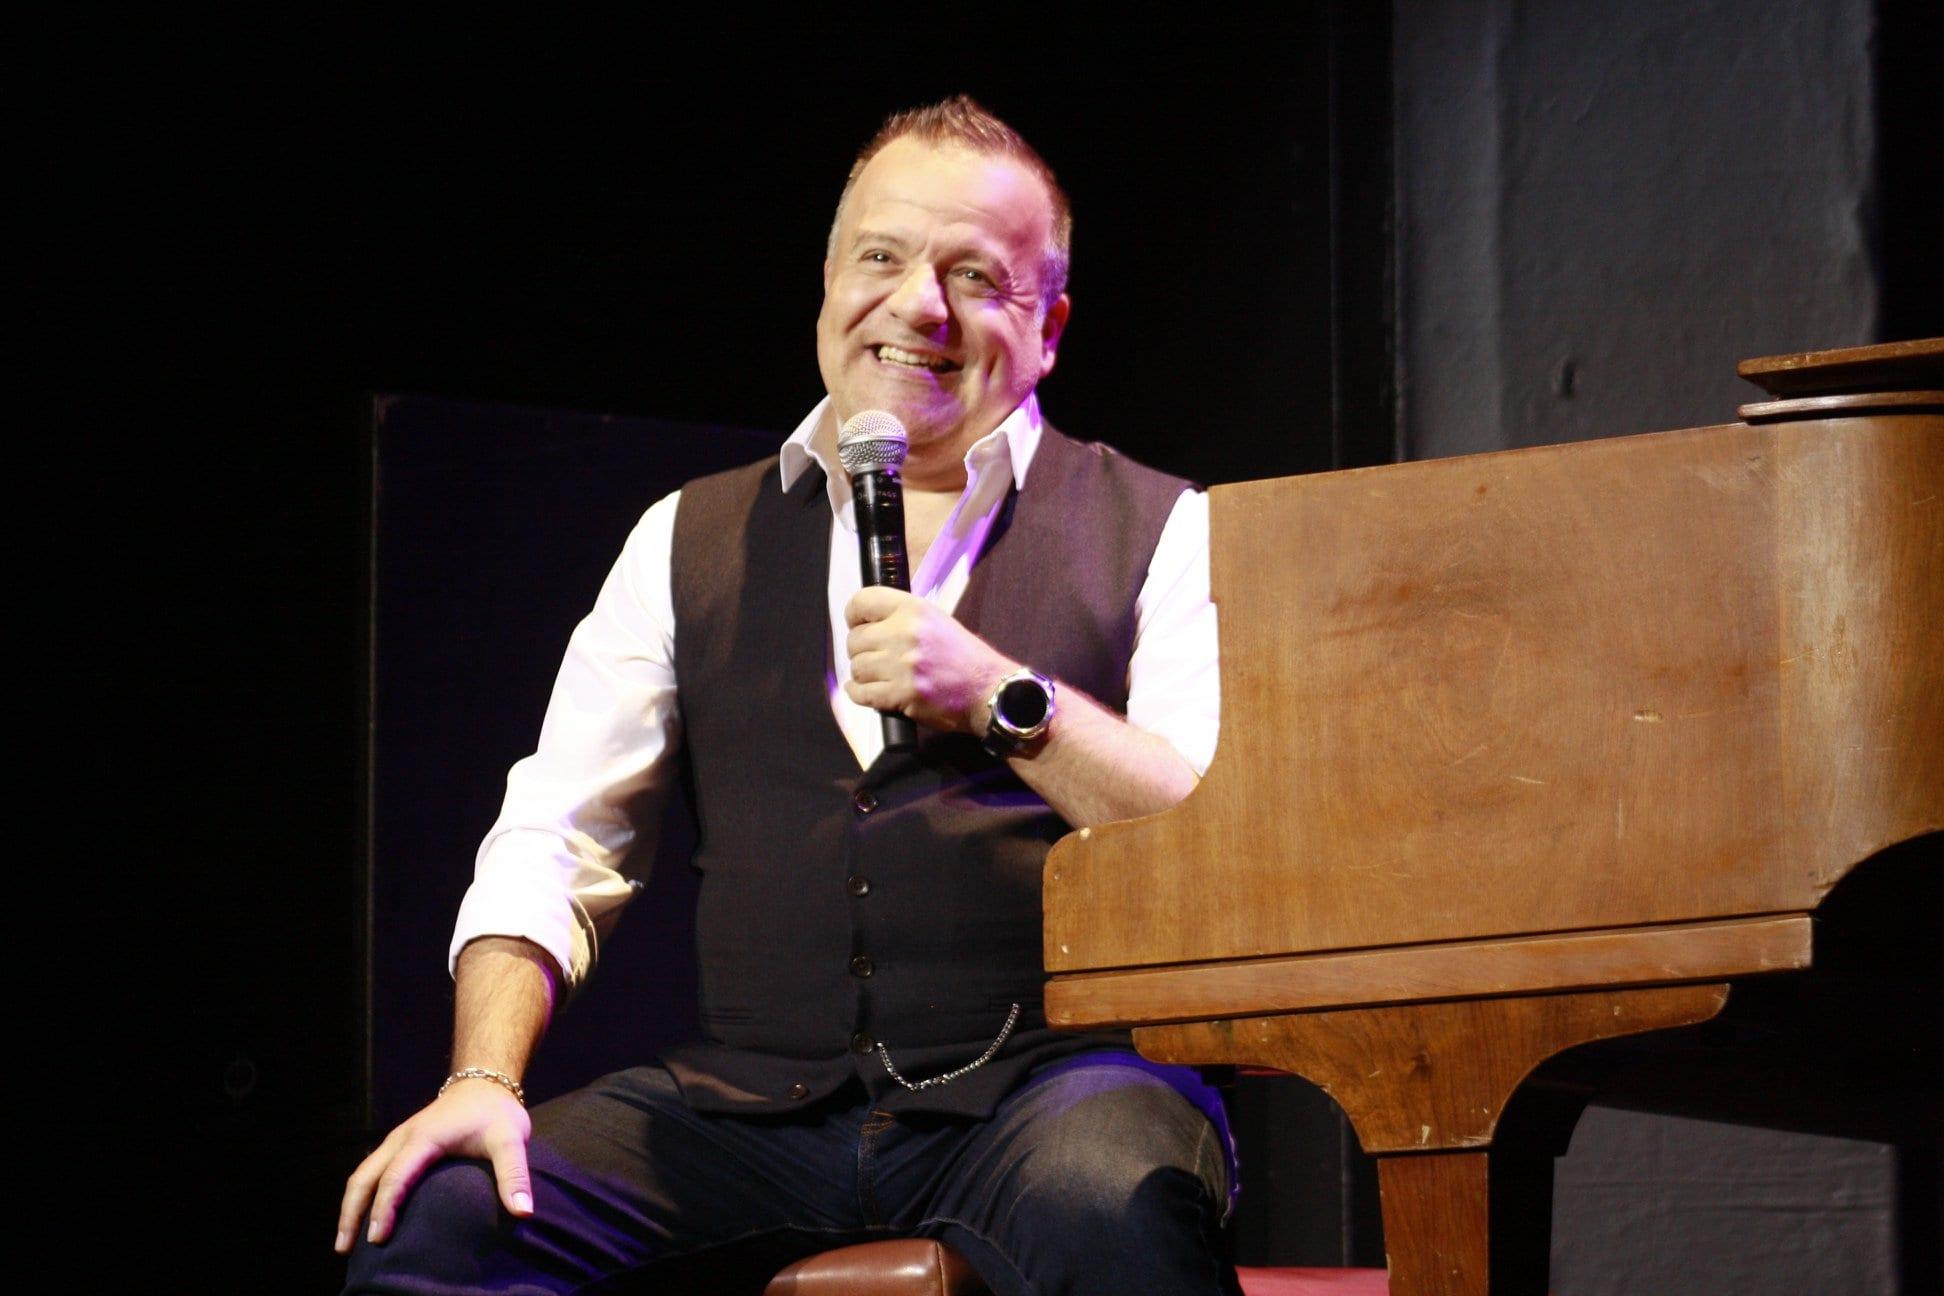 Promo Kev Orkian Comedian Surrey